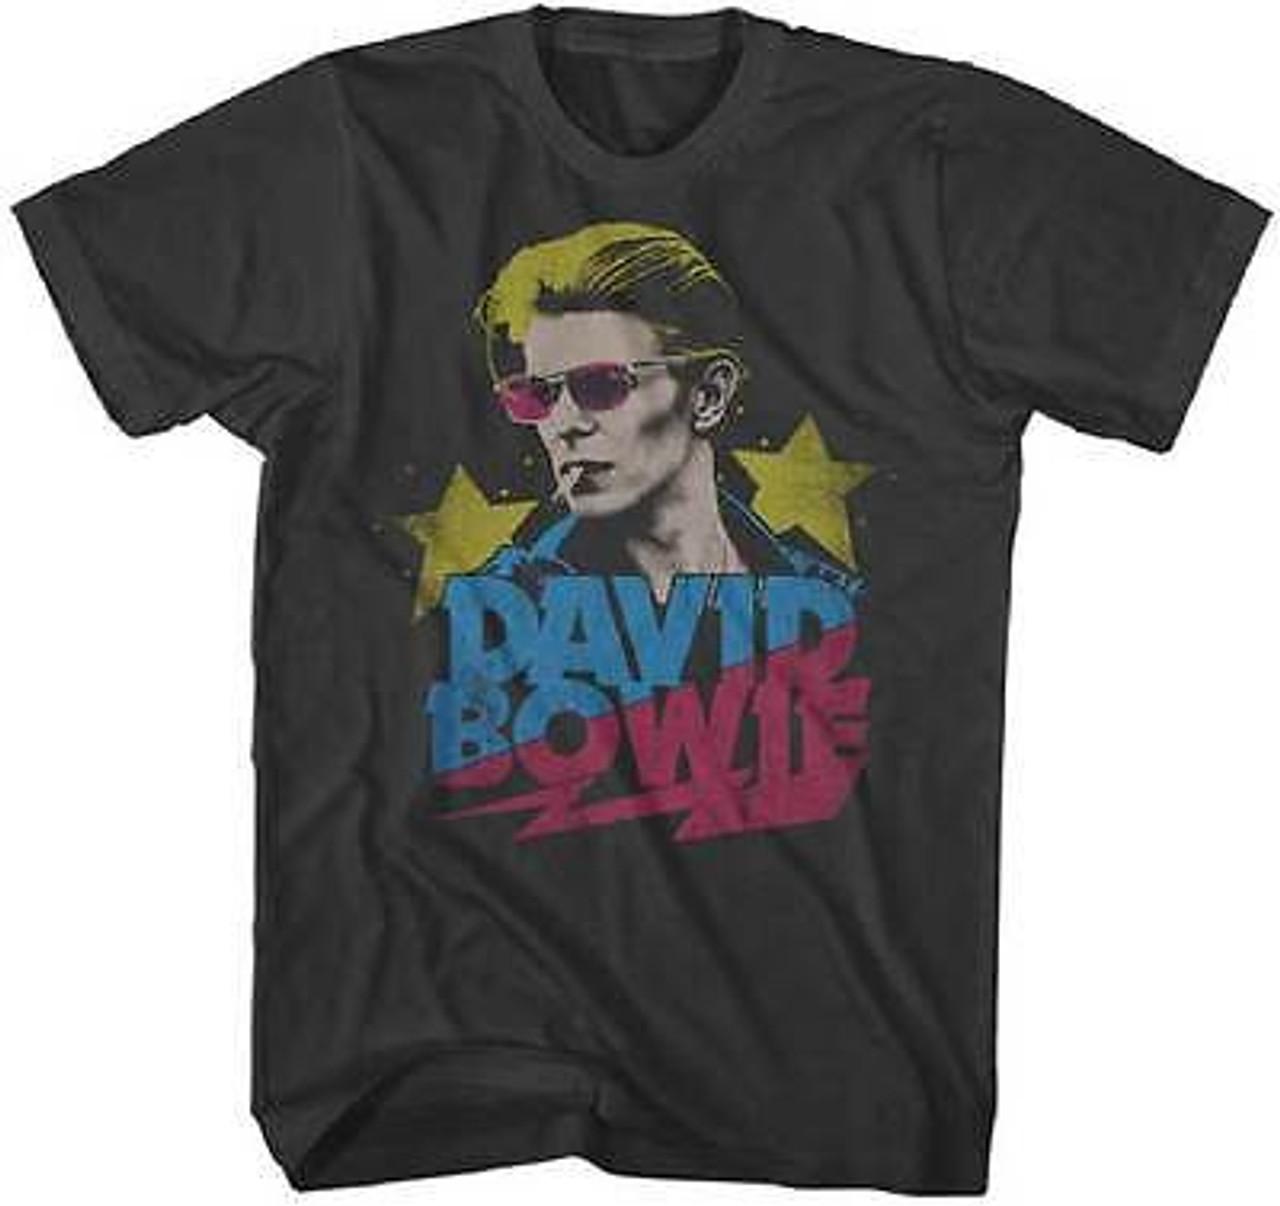 DAVID BOWIE RED SAX ZIGGY MEMORIAL BAND CLASSIC ROCK MUSIC T TEE SHIRT S-2XL